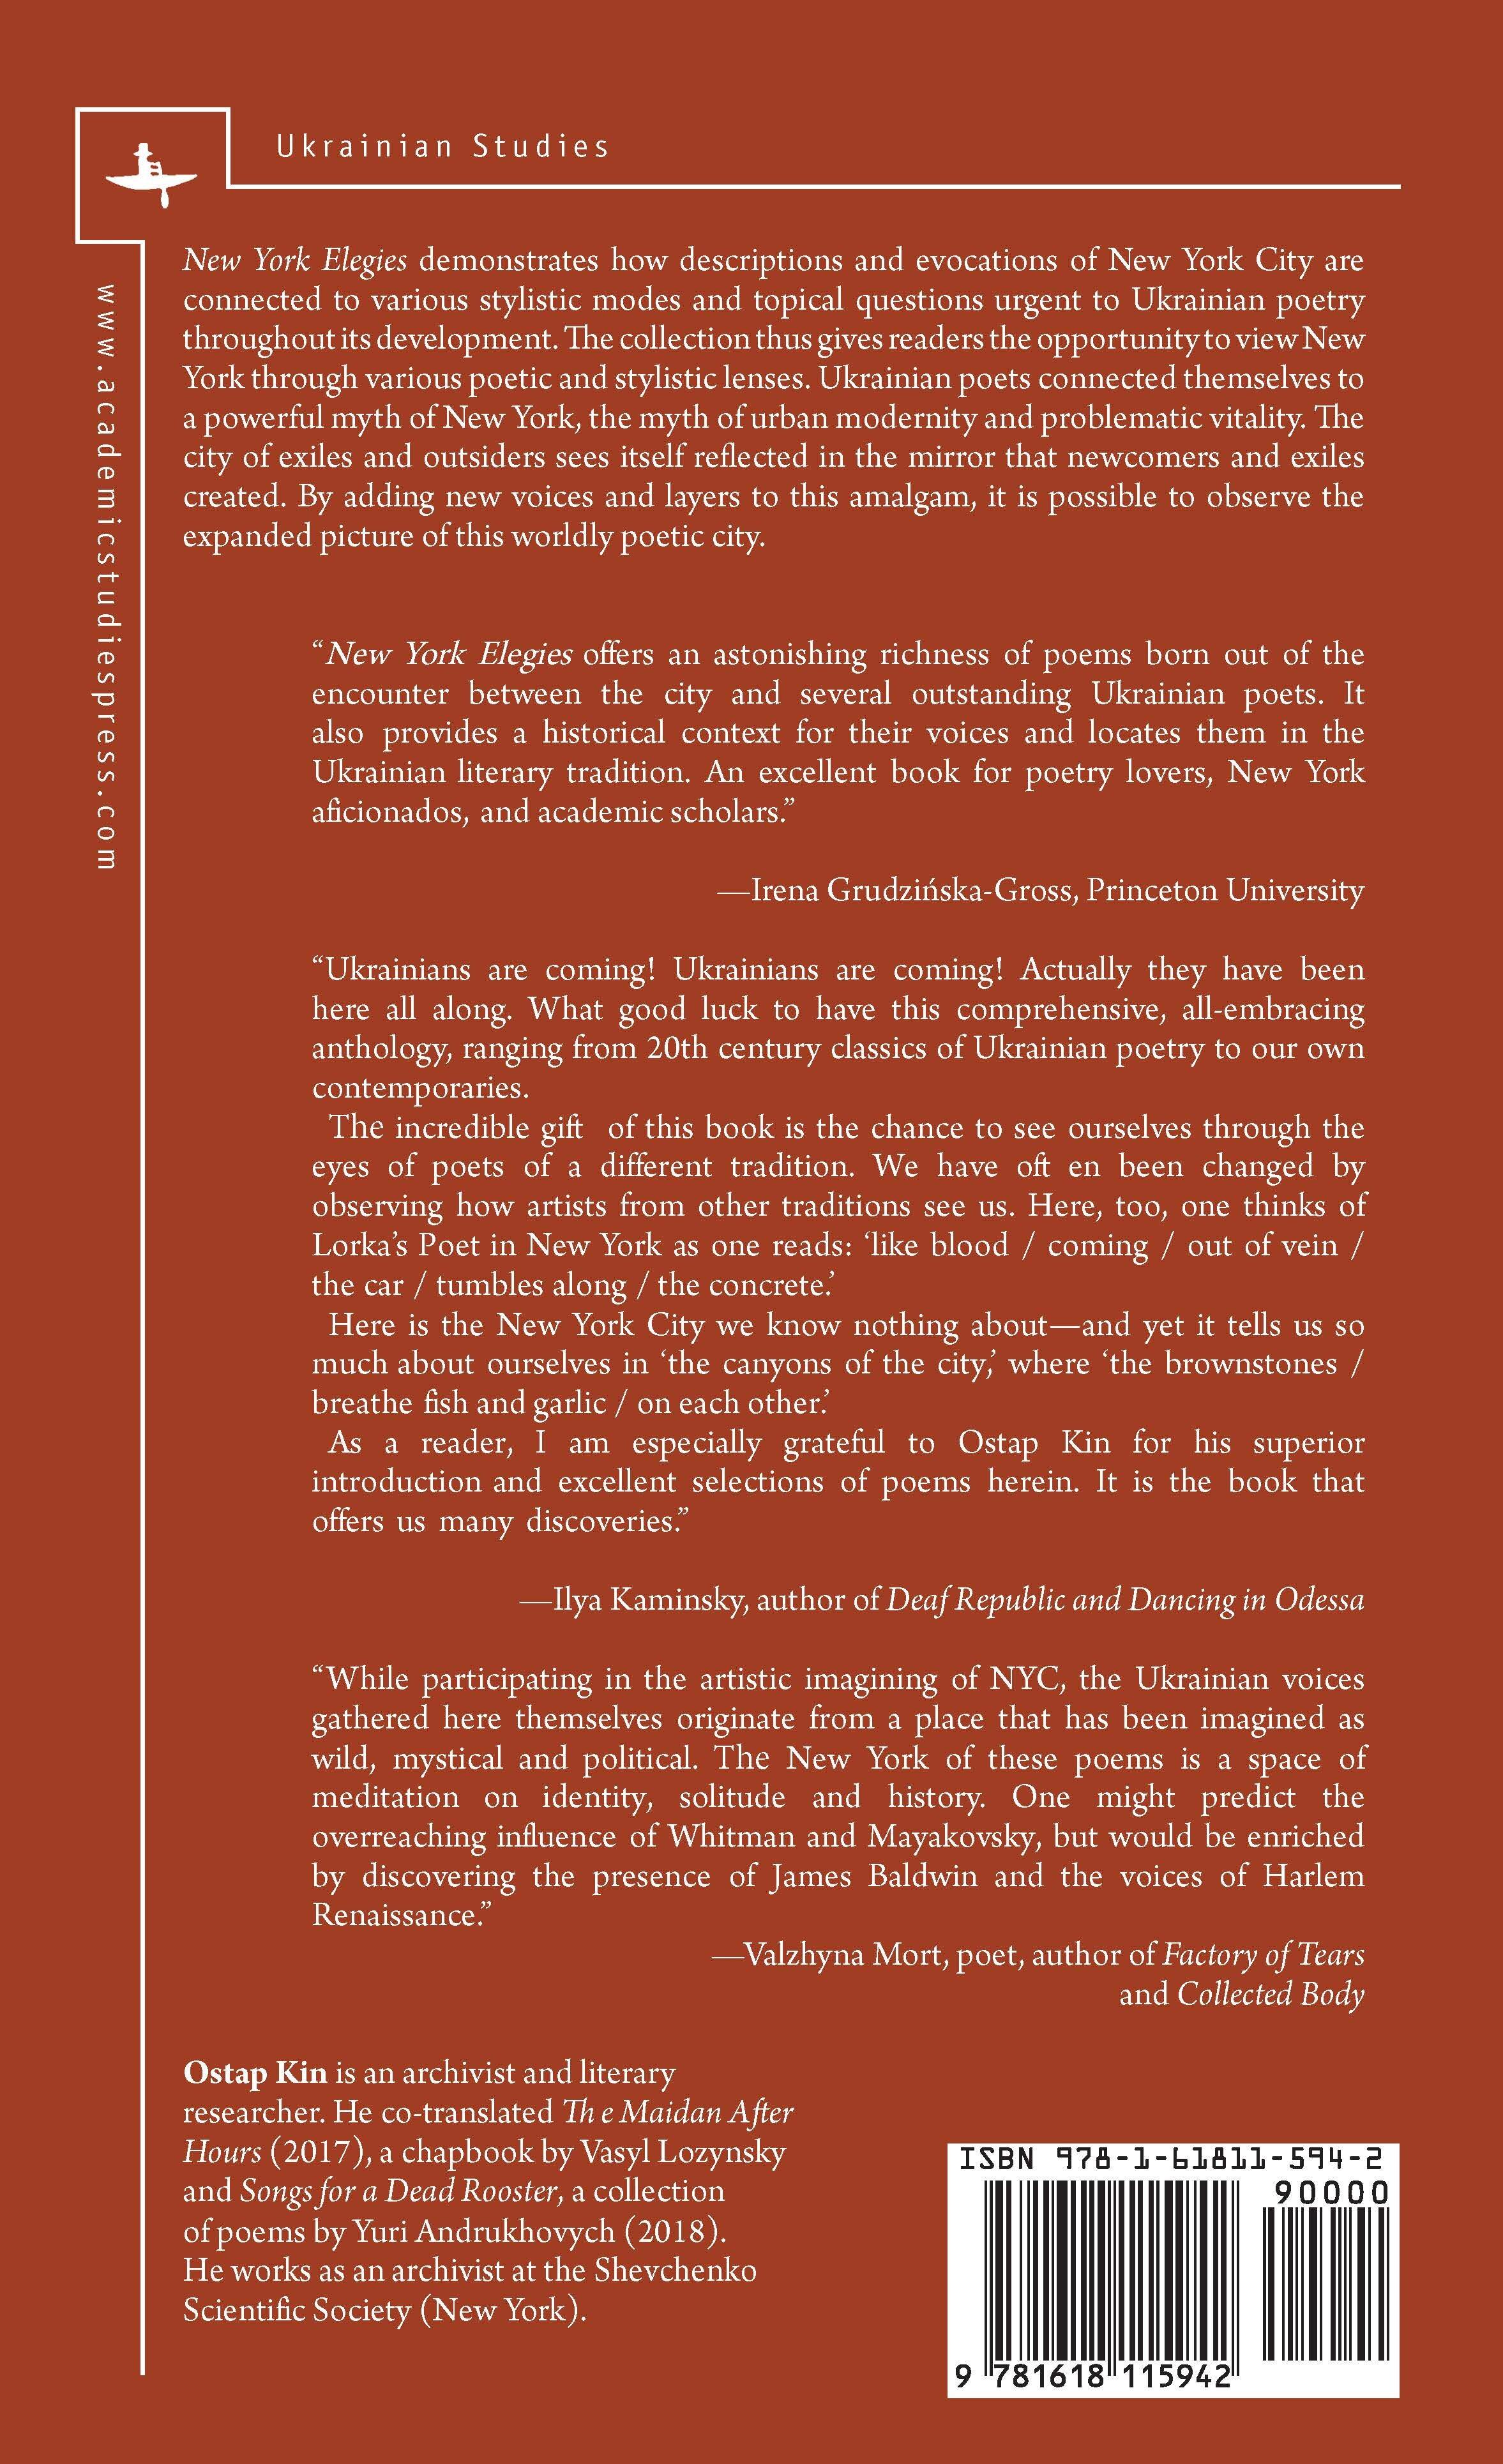 New York Elegies Ukrainian Poems On The City Academic Studies Press